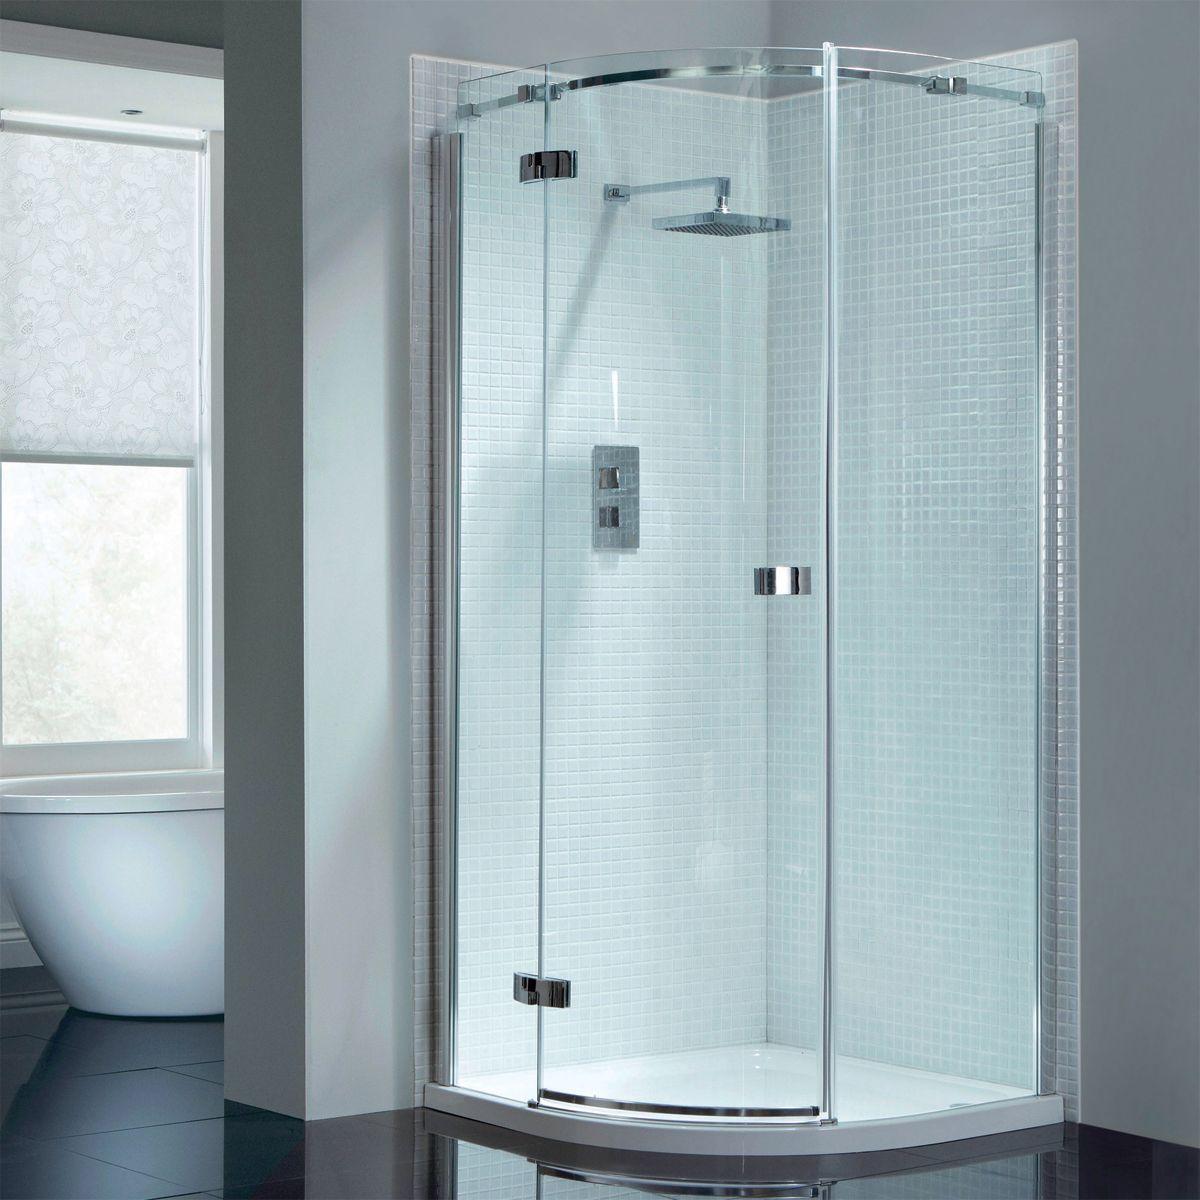 April Prestige2 Frameless Single Door Quadrant Shower Enclosure